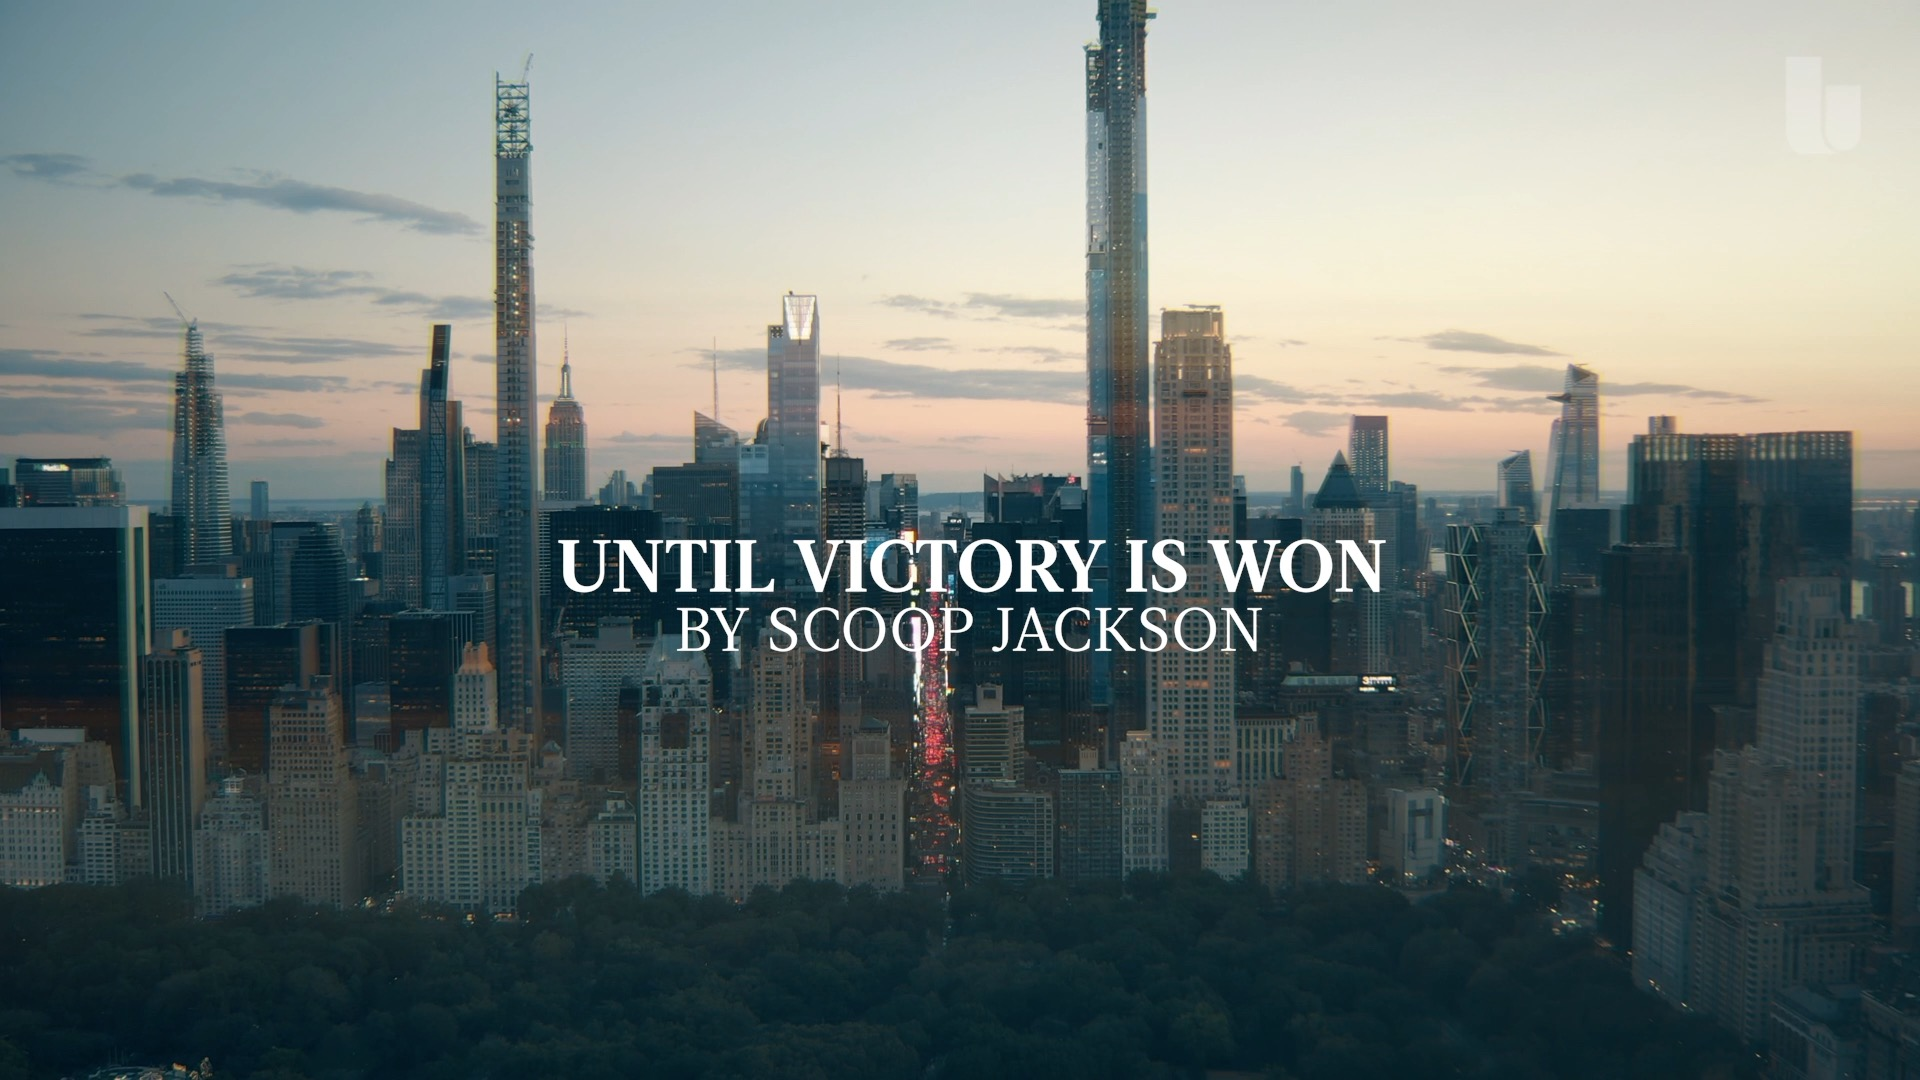 scoop jackson thumbnail